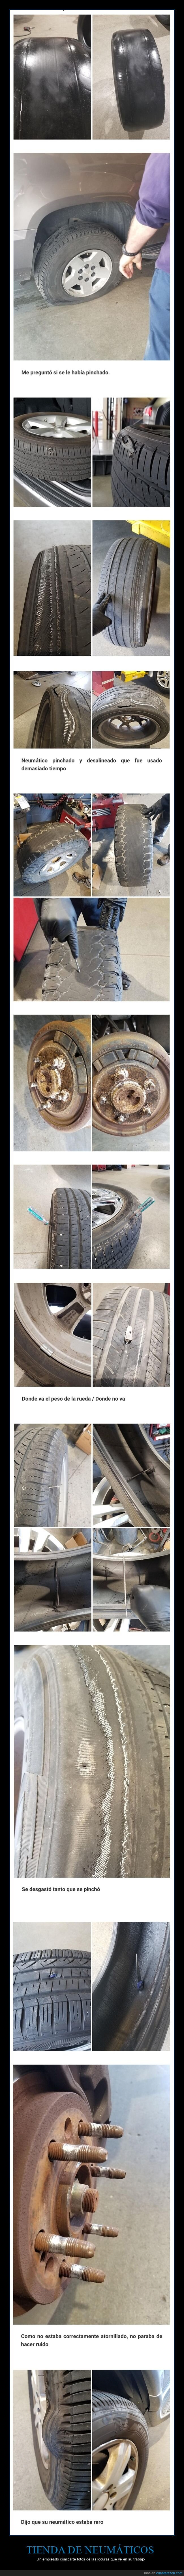 coches,fails,neumáticos